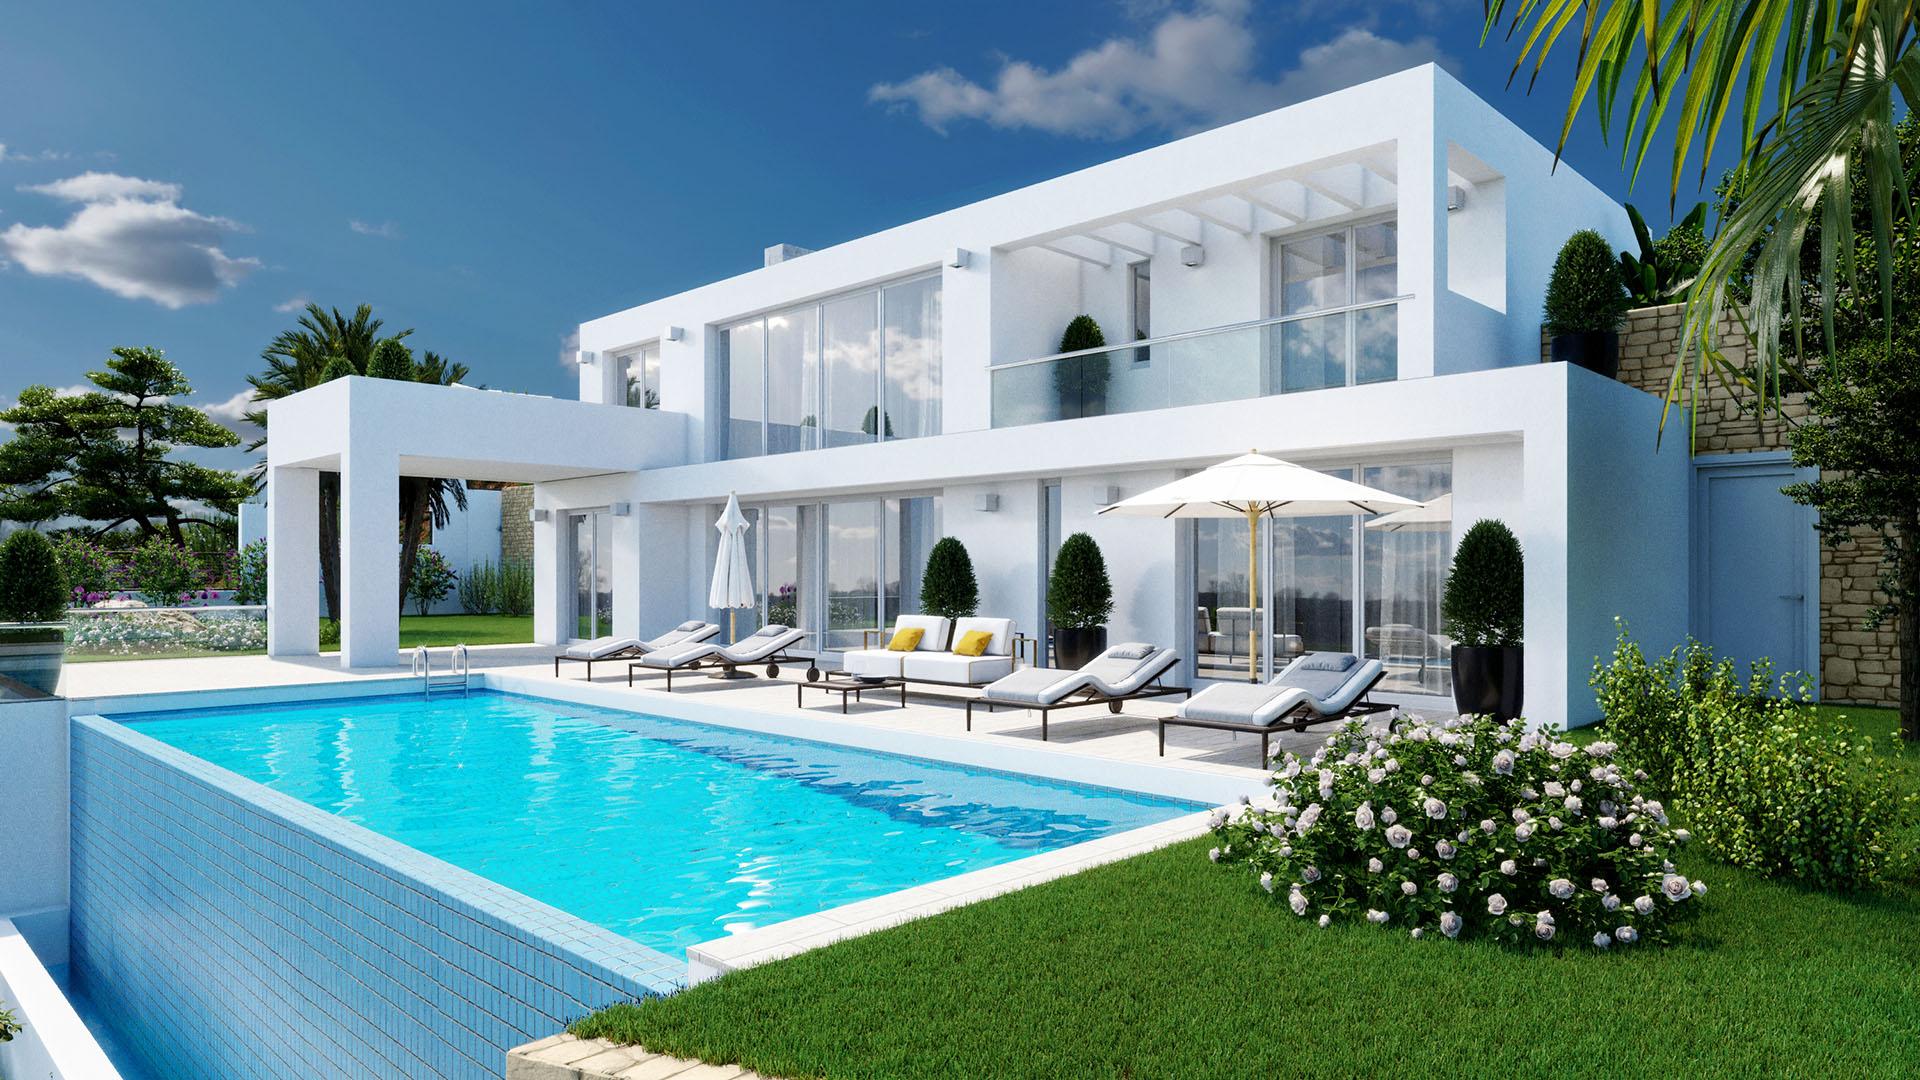 Villa La Mairena 1511: Modern villa on the east side of Marbella